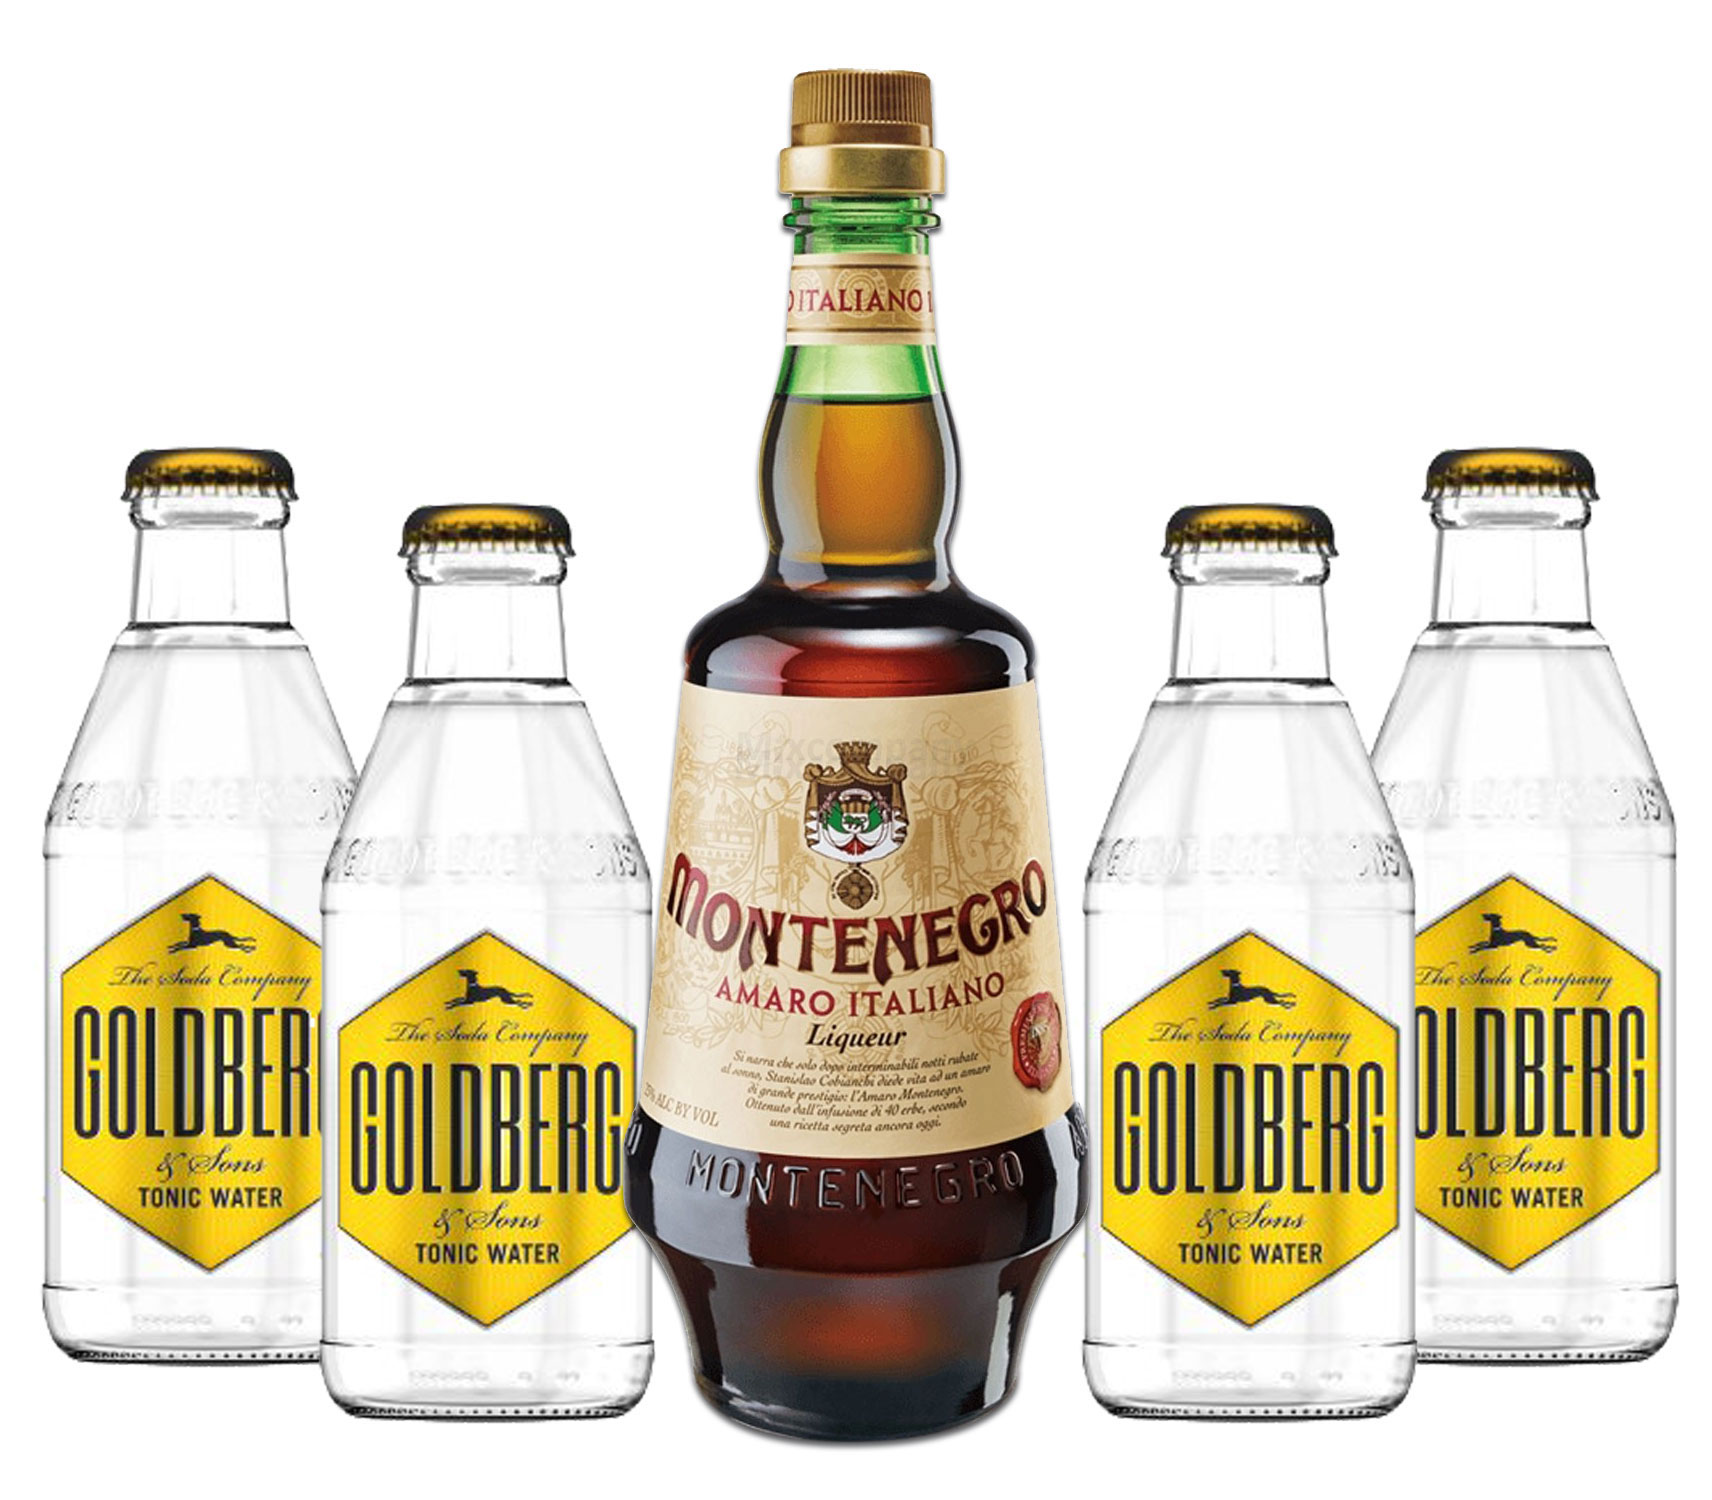 Montenegro & Tonic Set - Montenegro Amaro Italiano Likör 0,7L (23% Vol) + 4x Goldberg Tonic Water 200ml inkl. Pfand MEHRWEG